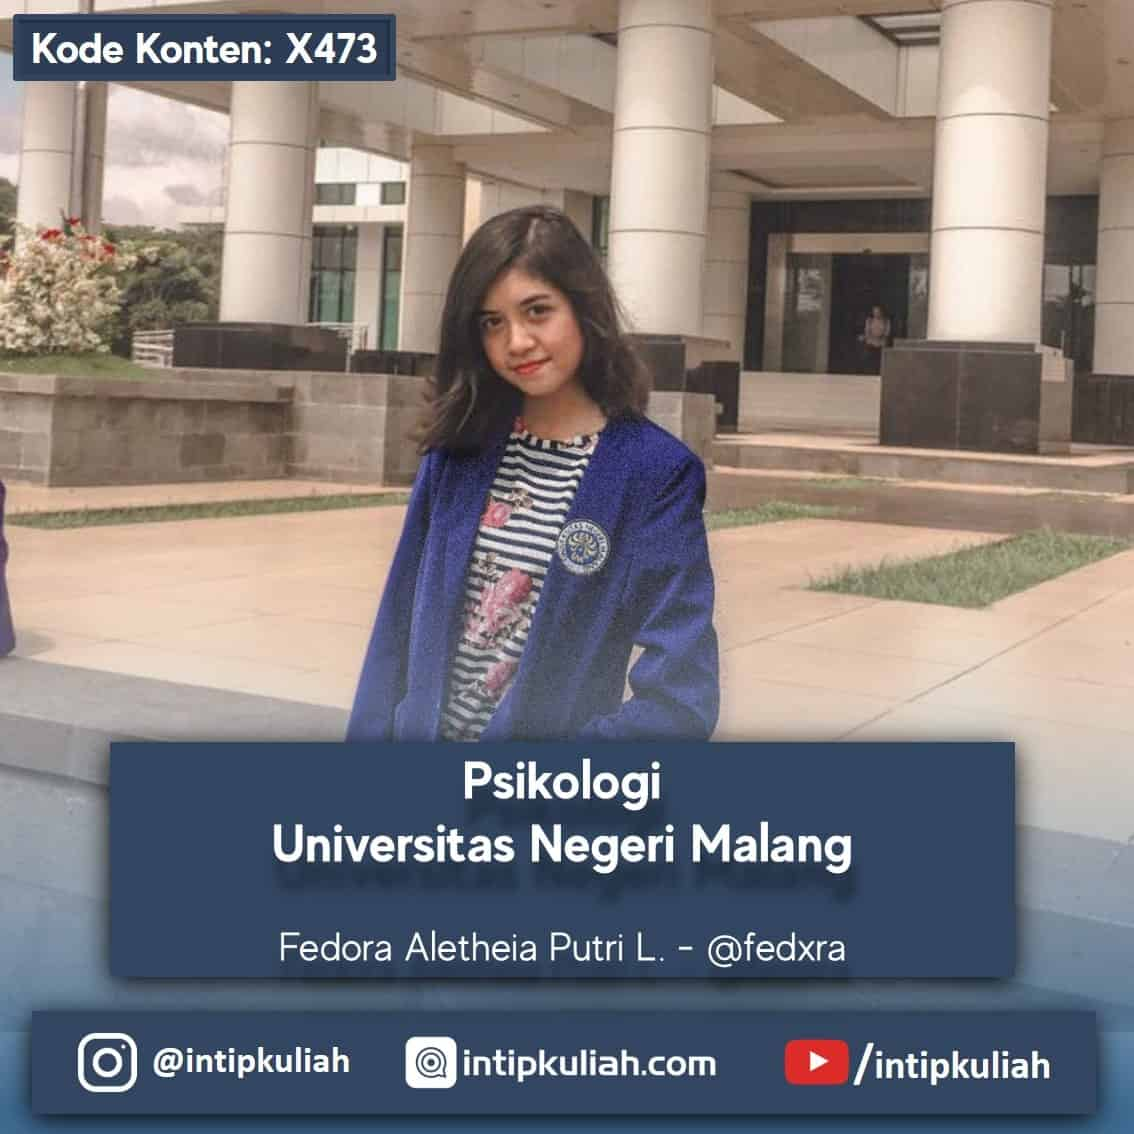 Psikologi Universitas Negeri Malang (Fedora)